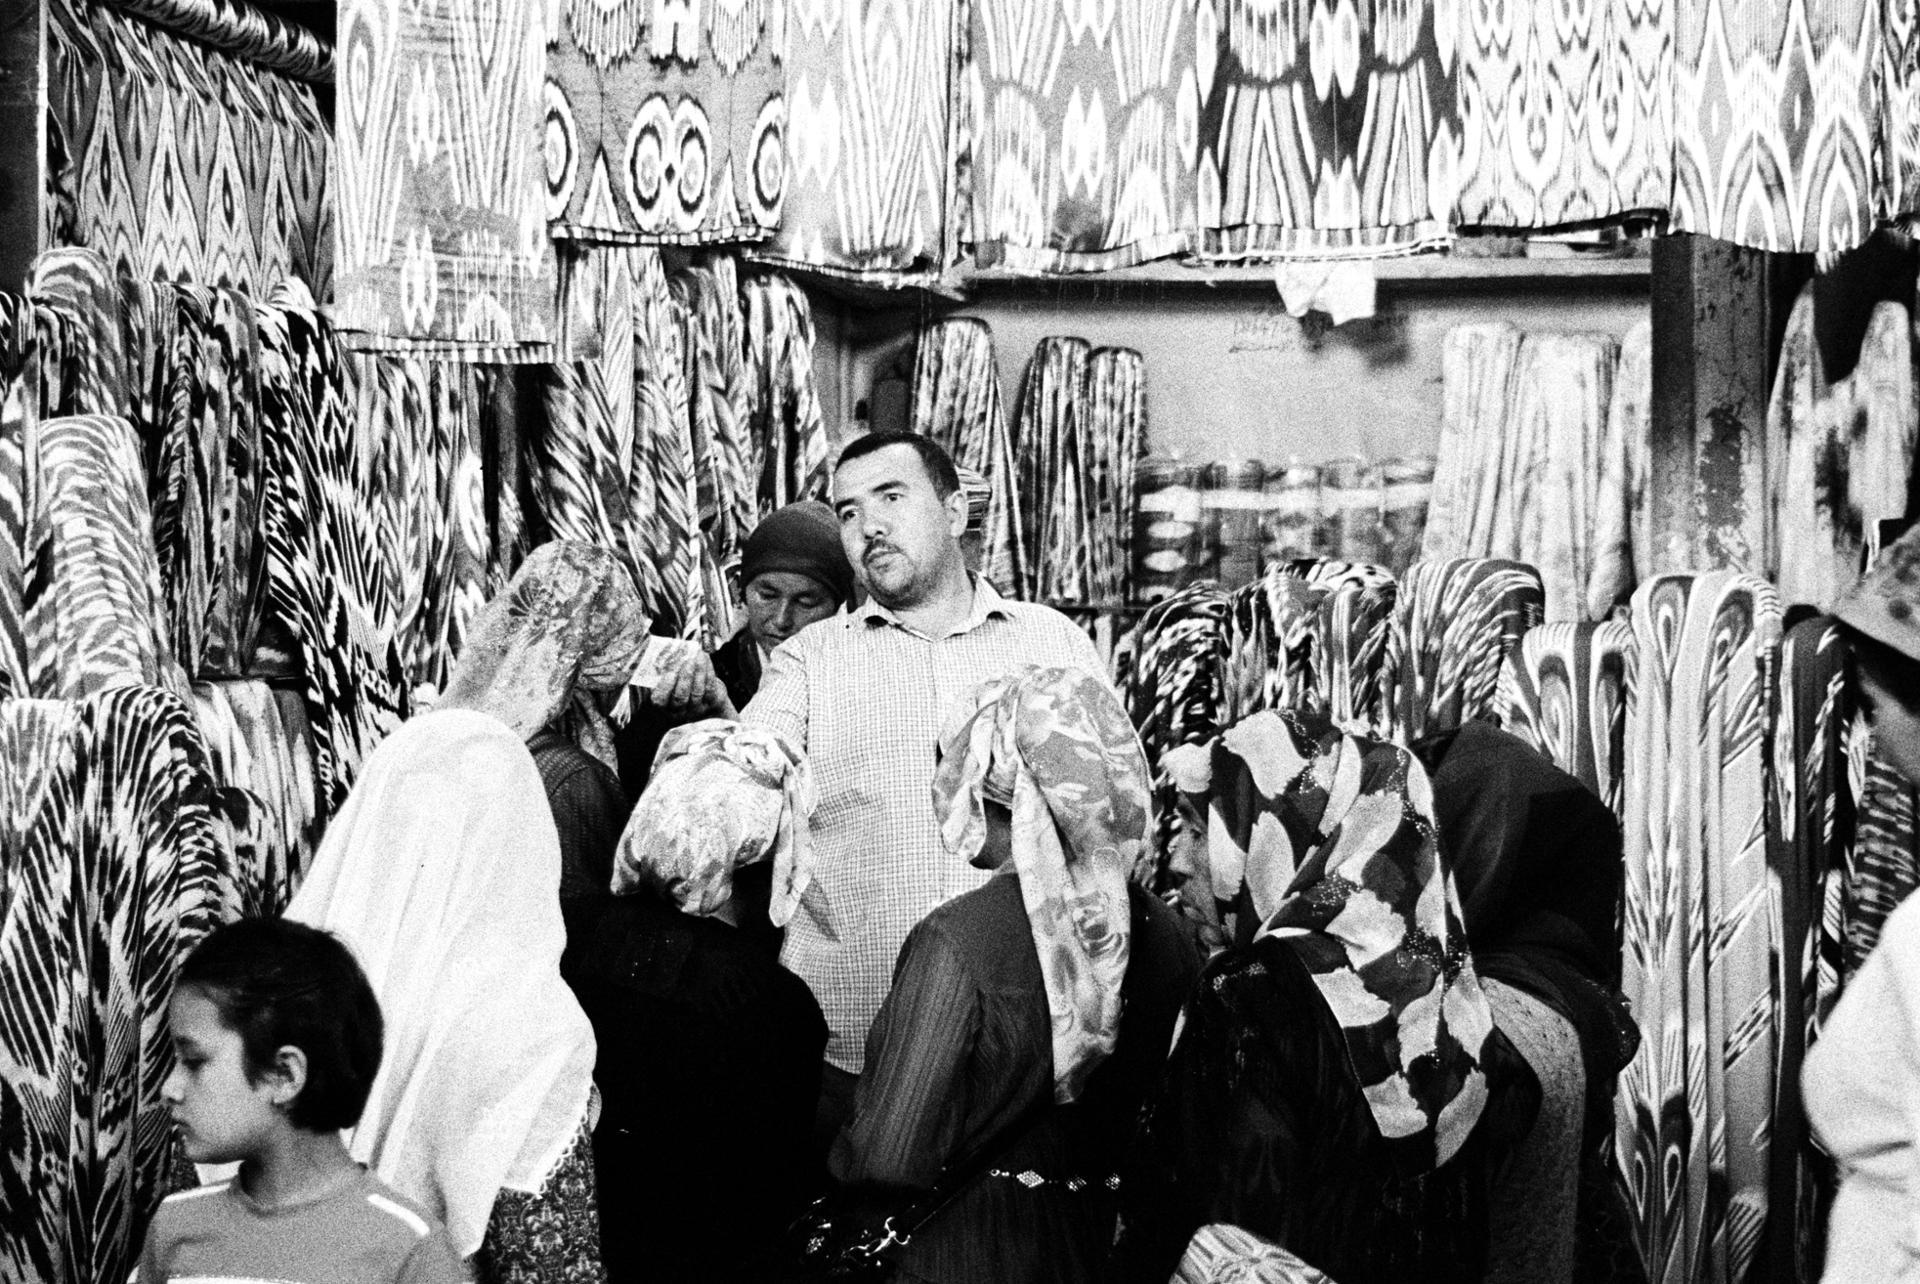 Workers 7 - le vendeur de tissu